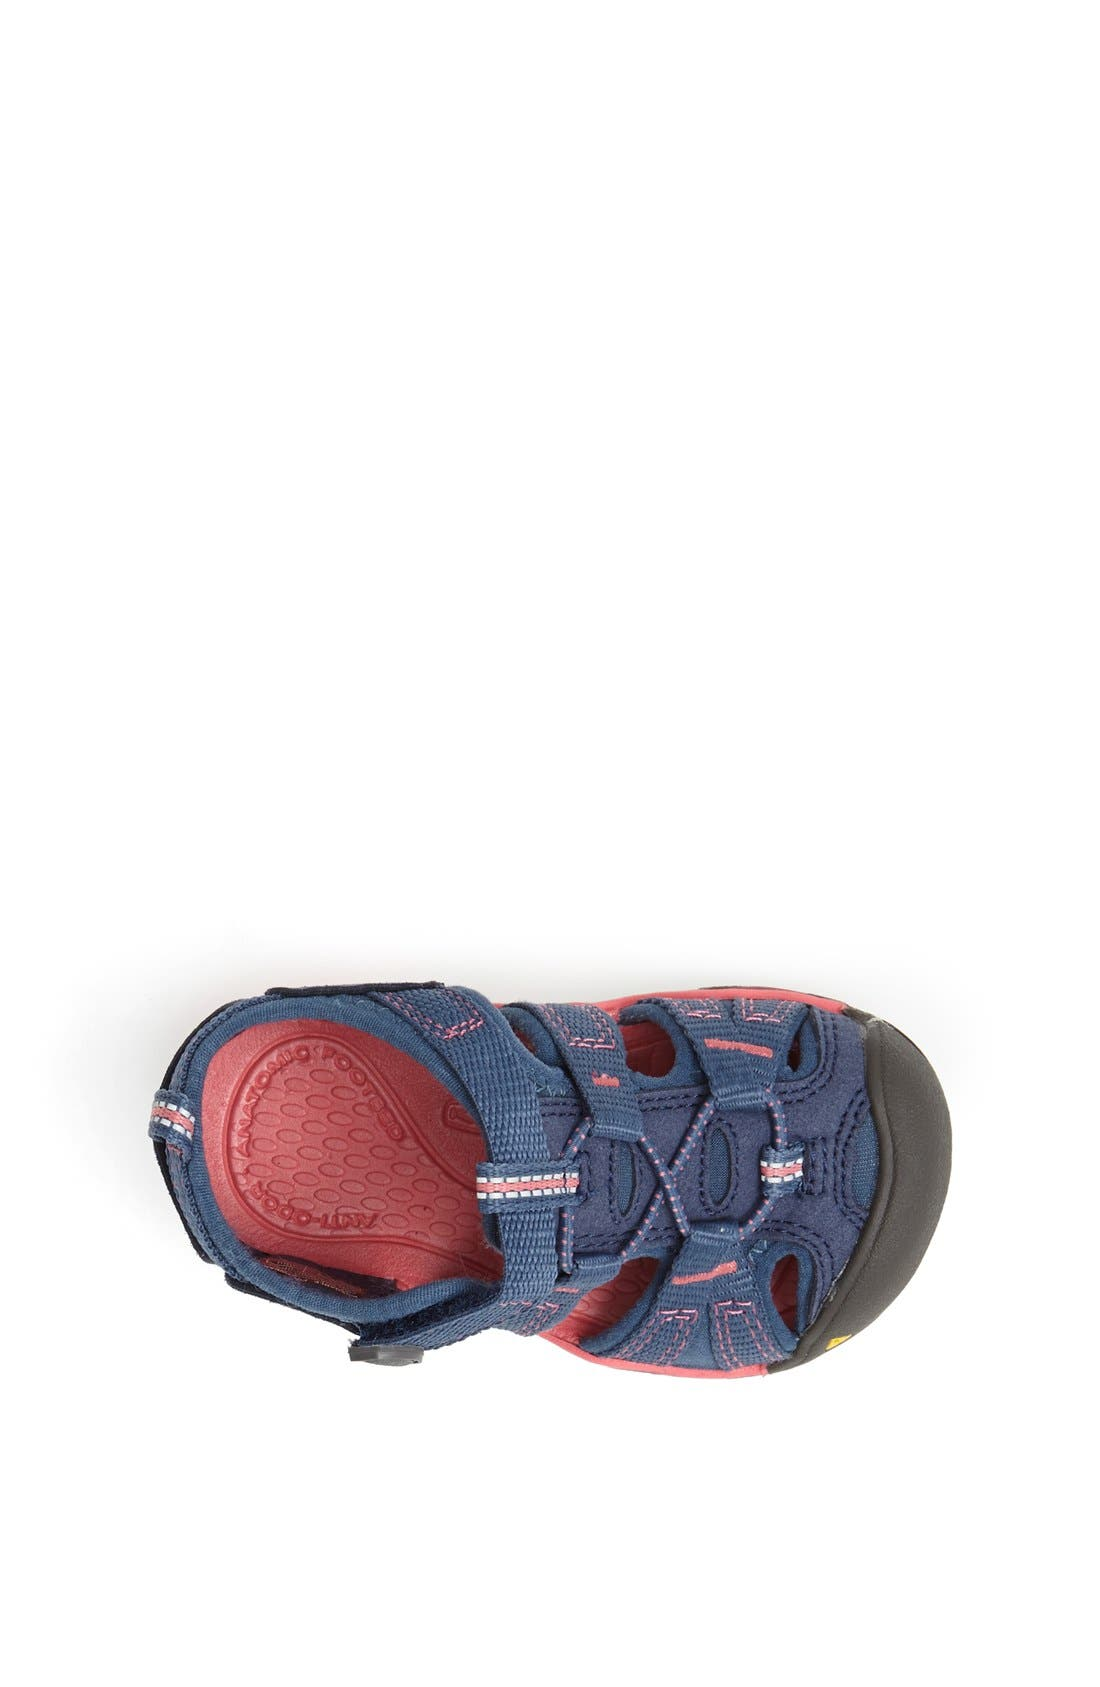 'Seacamp II' Waterproof Sandal,                             Alternate thumbnail 2, color,                             415